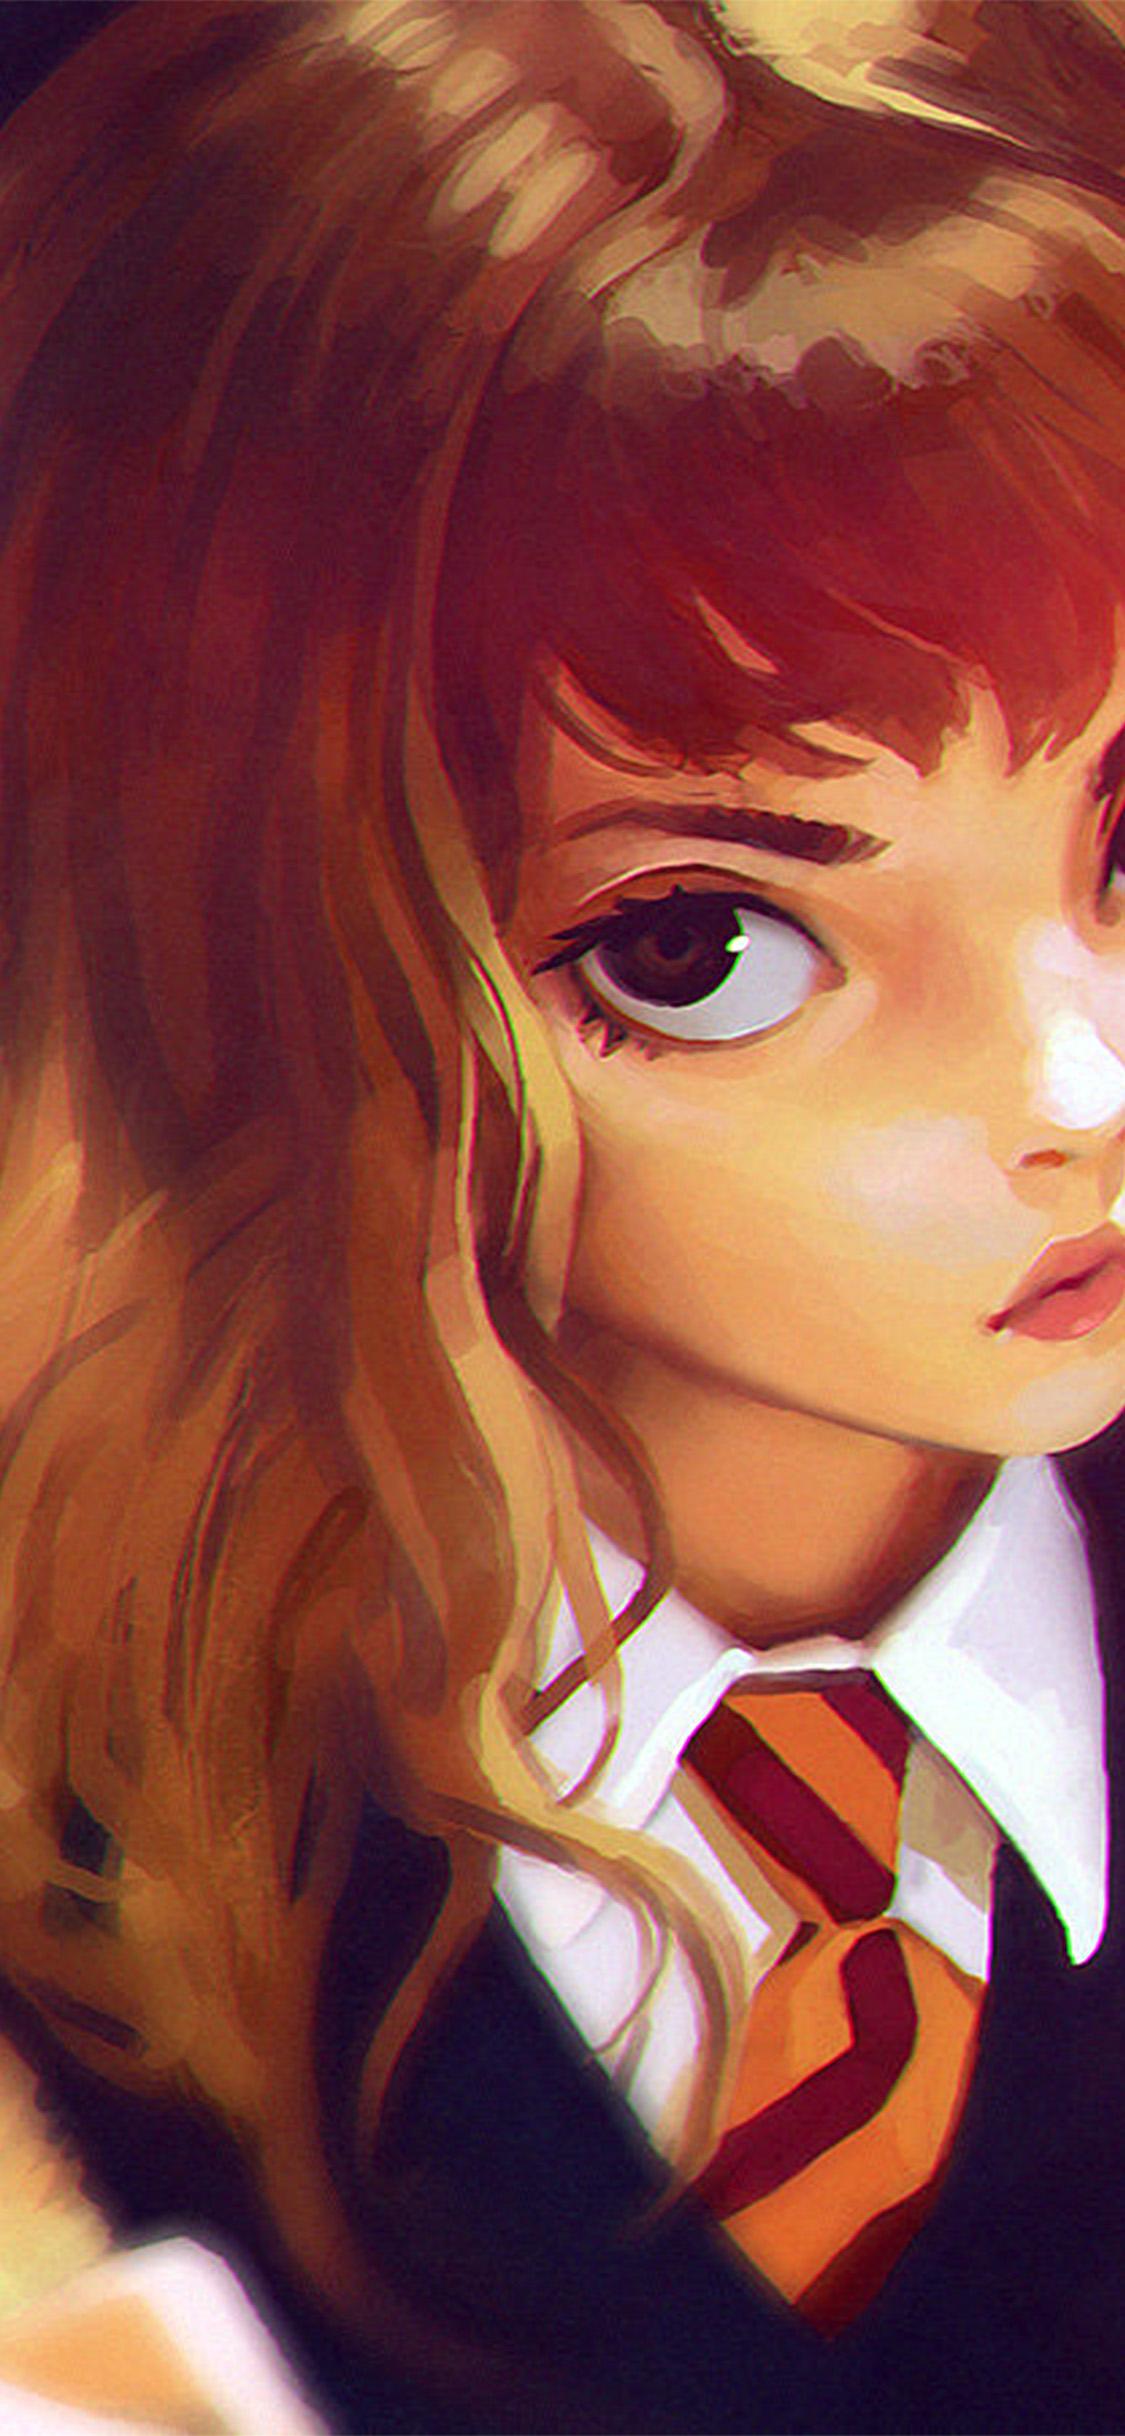 Papersco Iphone Wallpaper Bd66 Hermione Harry Potter